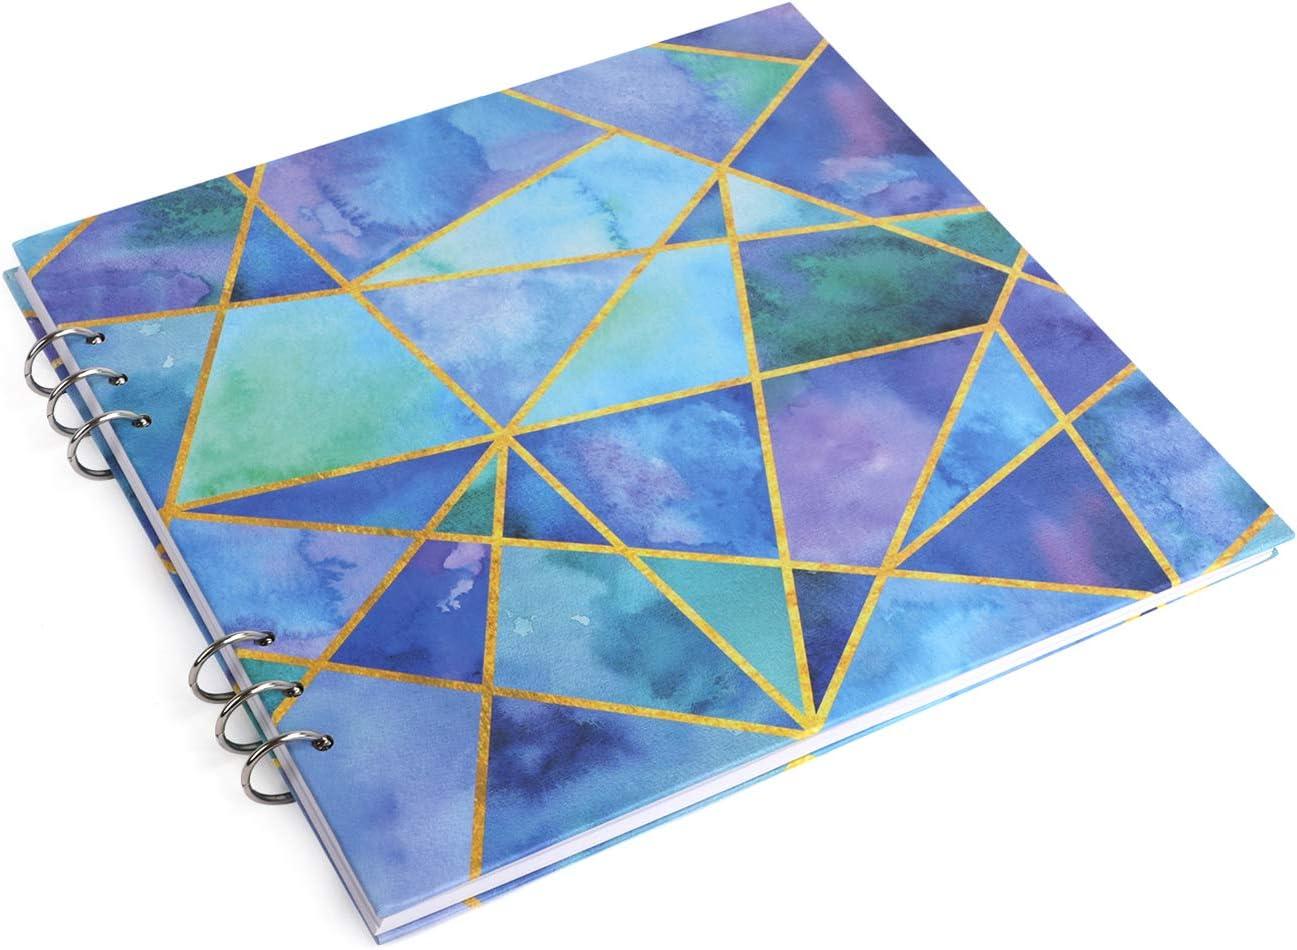 Wirebound LargerTravel Journal Notebook 40 Sheets Side Spiral Blank Sketchbook Unlined Scrapbook Personal Planner Agenda Organizer,Dream Goal Notepads,School Office Stationery Gifts Pink